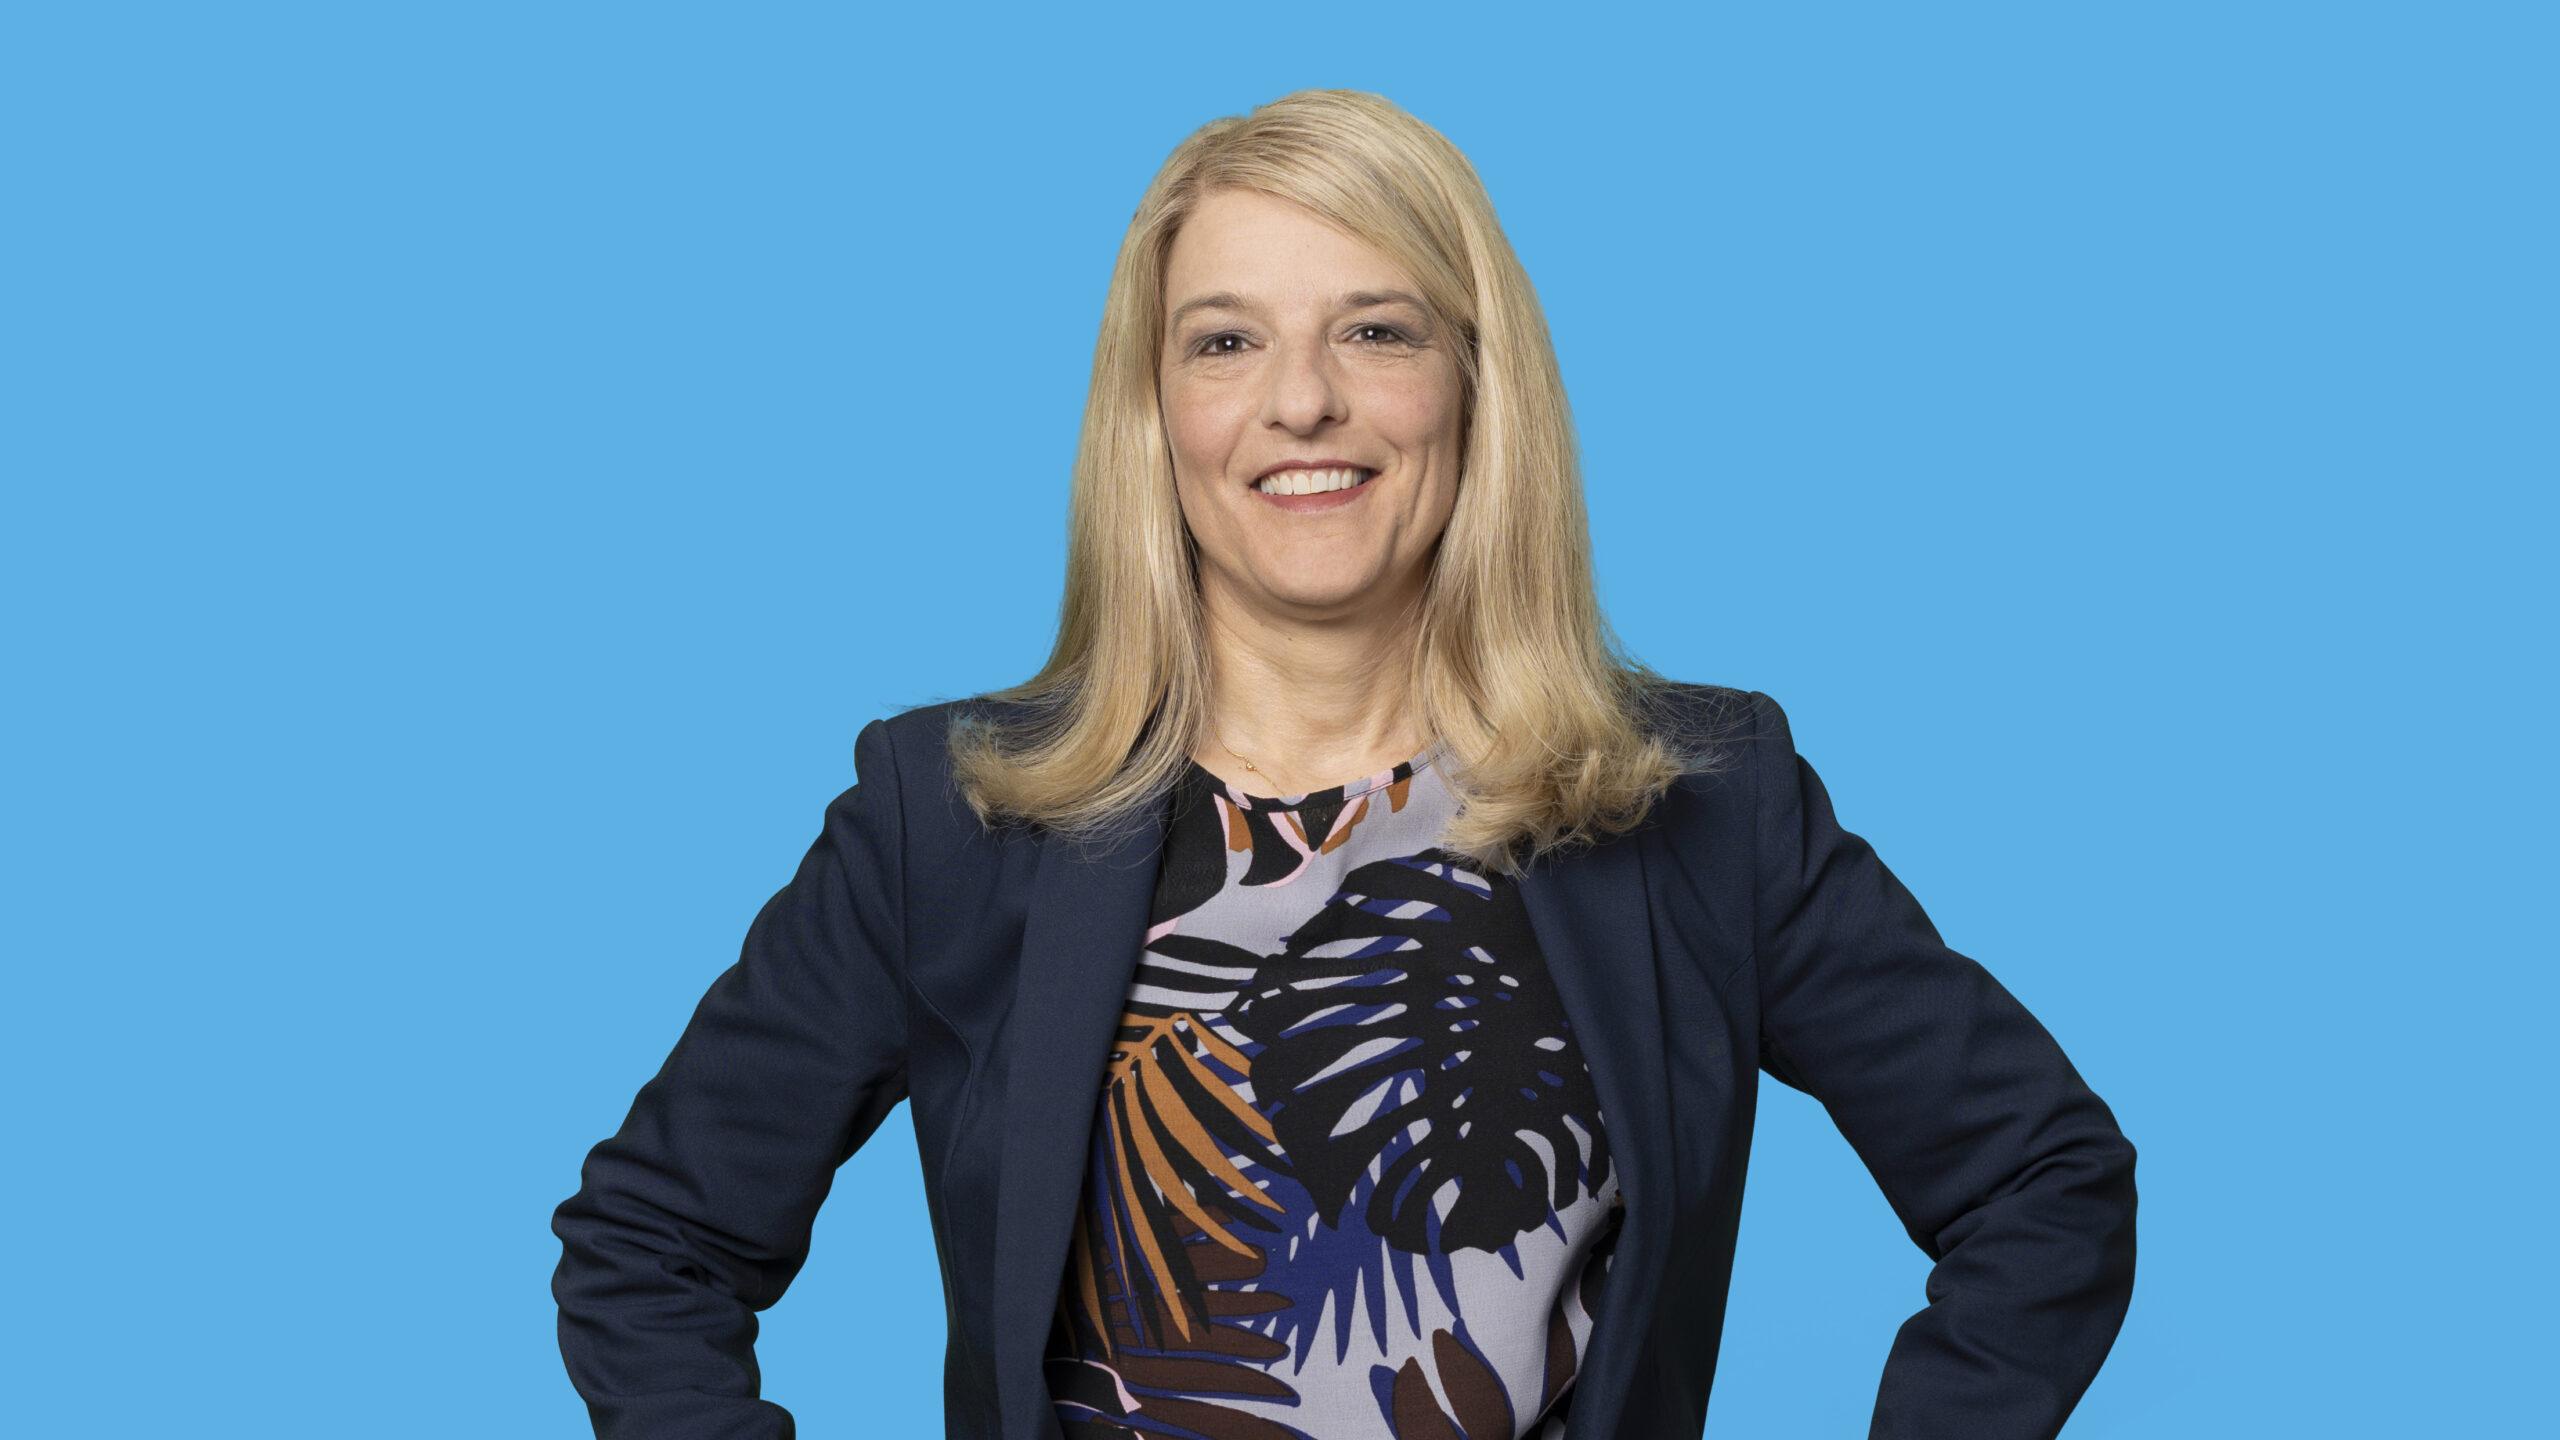 Carol Haller